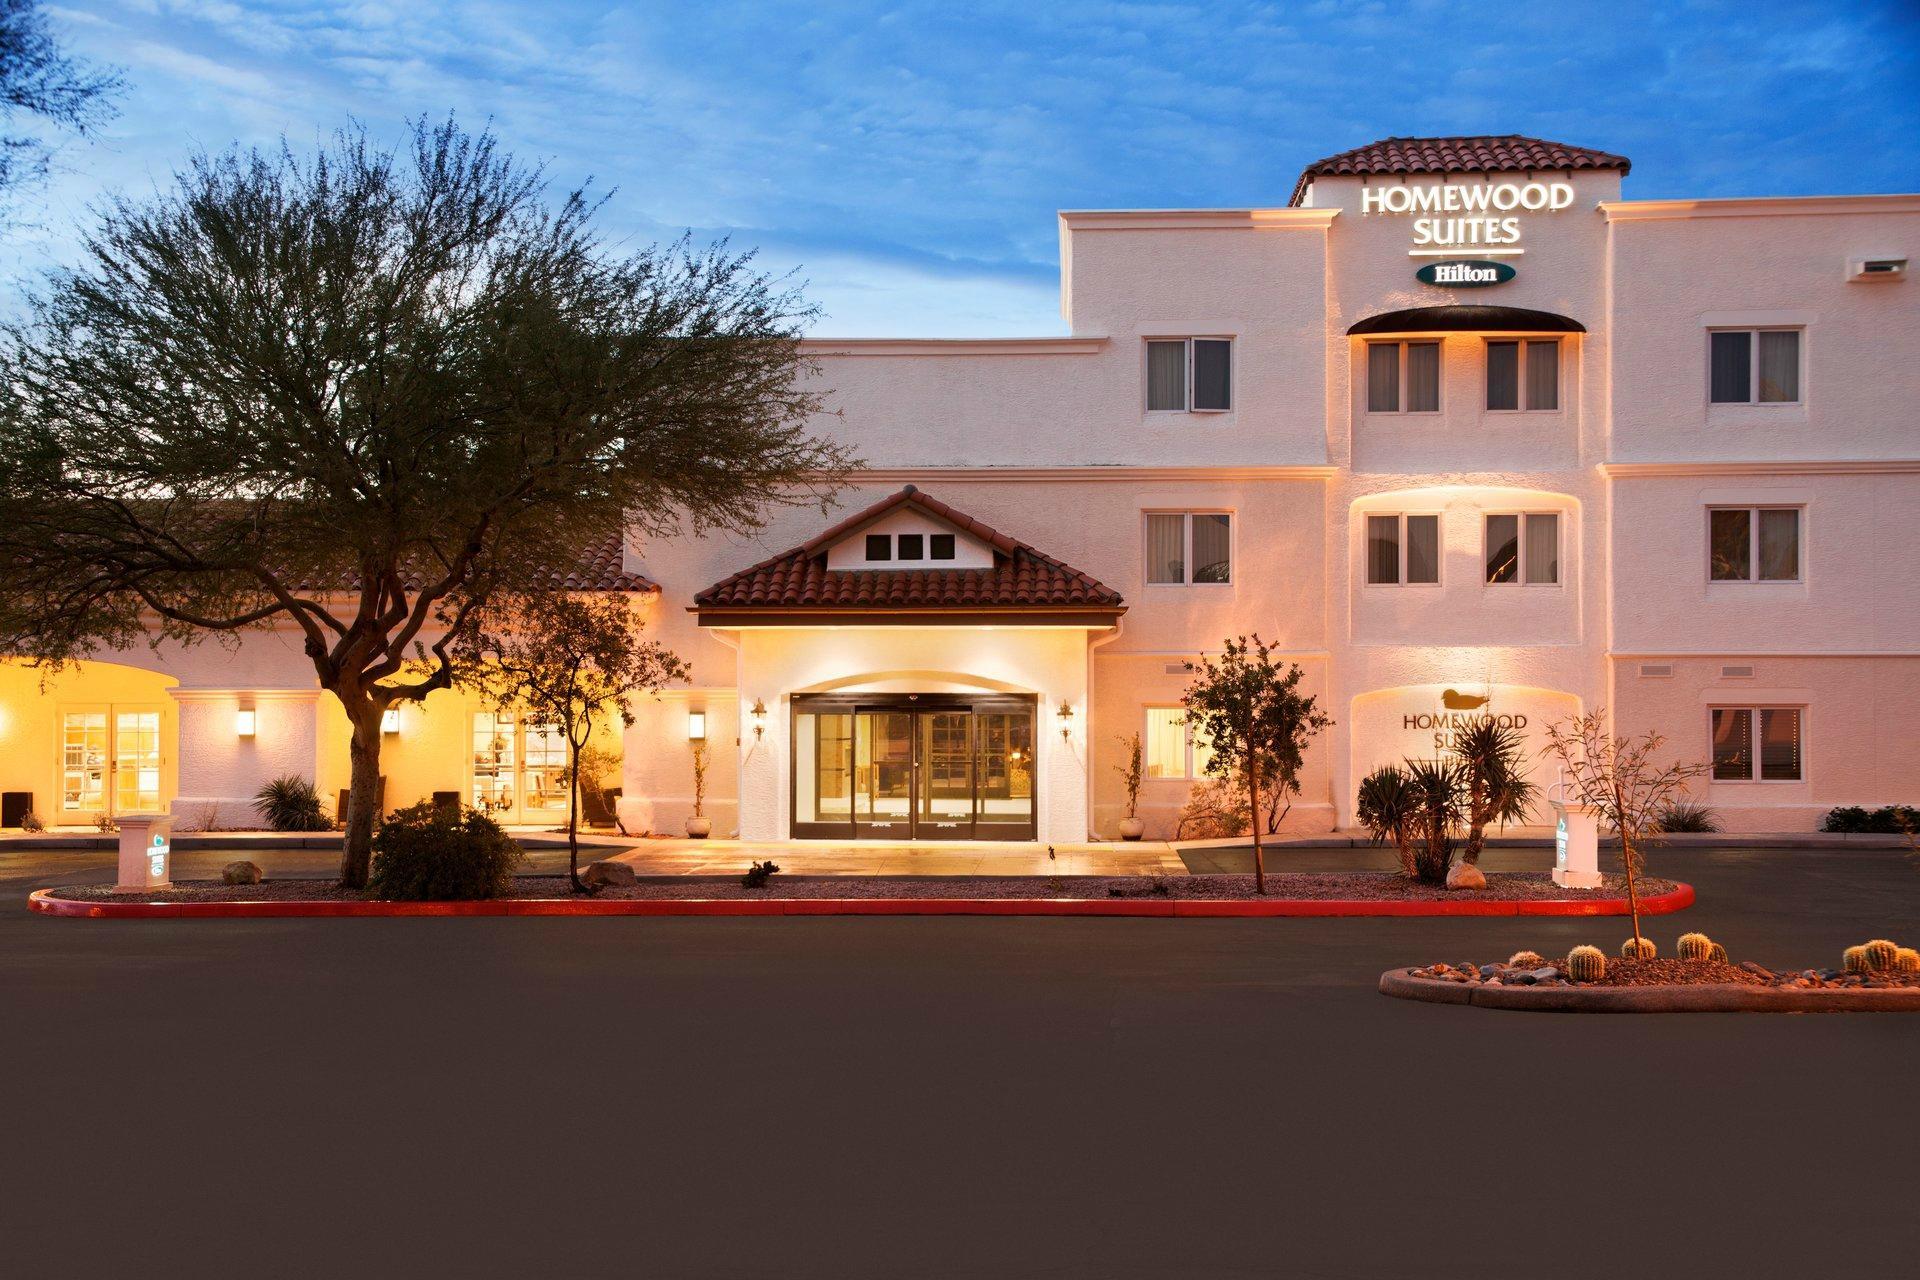 the 30 best tucson, az family hotels & kid friendly resorts